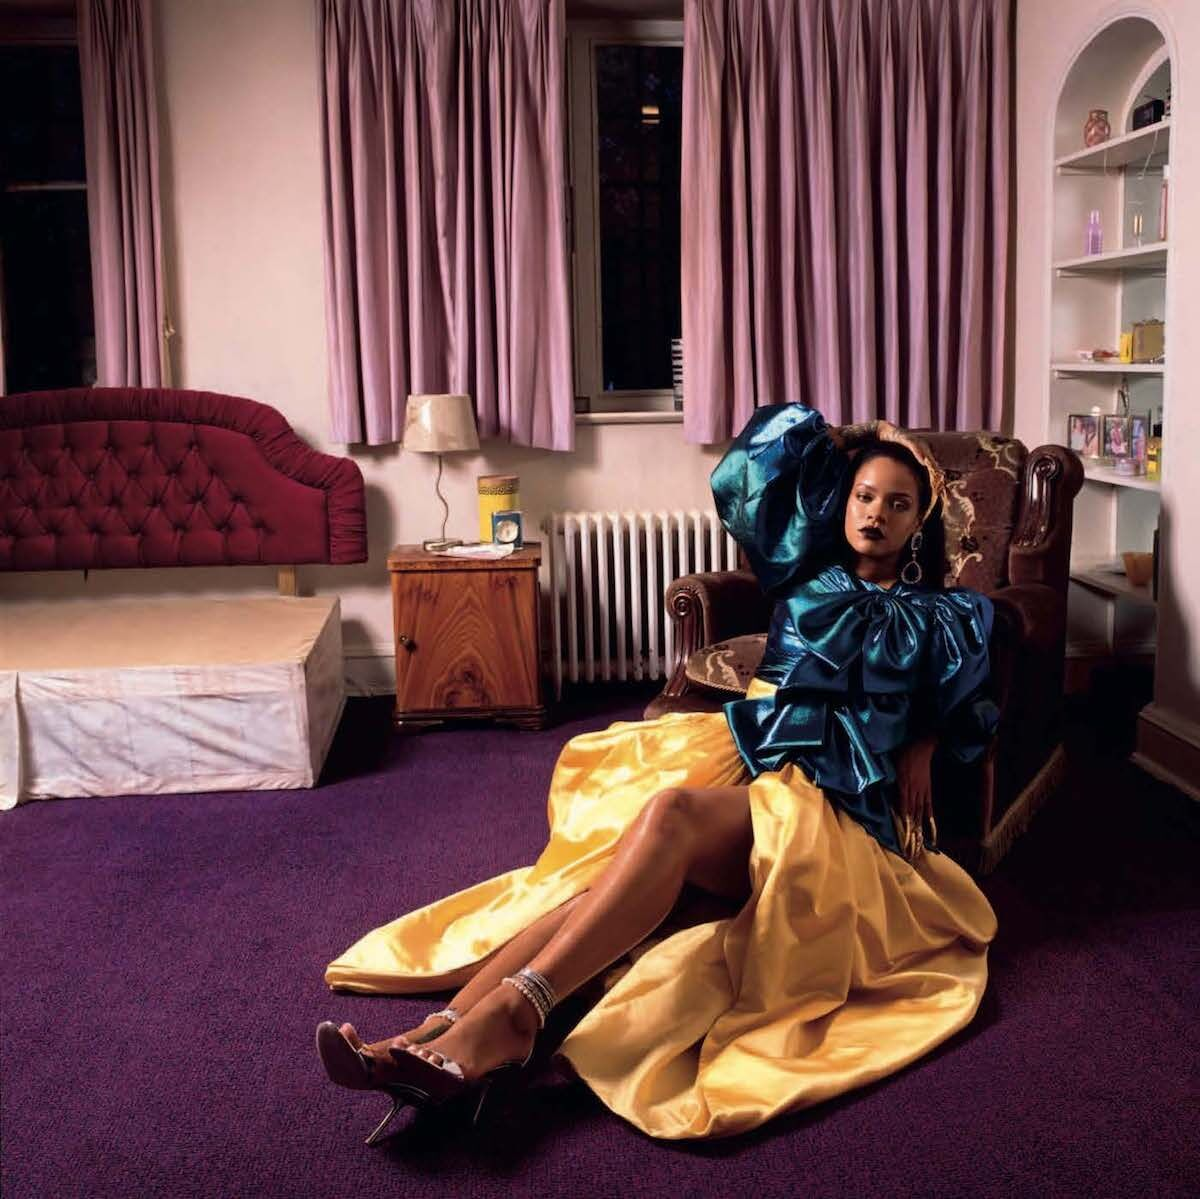 Rihanna photographed by Deana Lawson. Courtesy Garage Magazine.